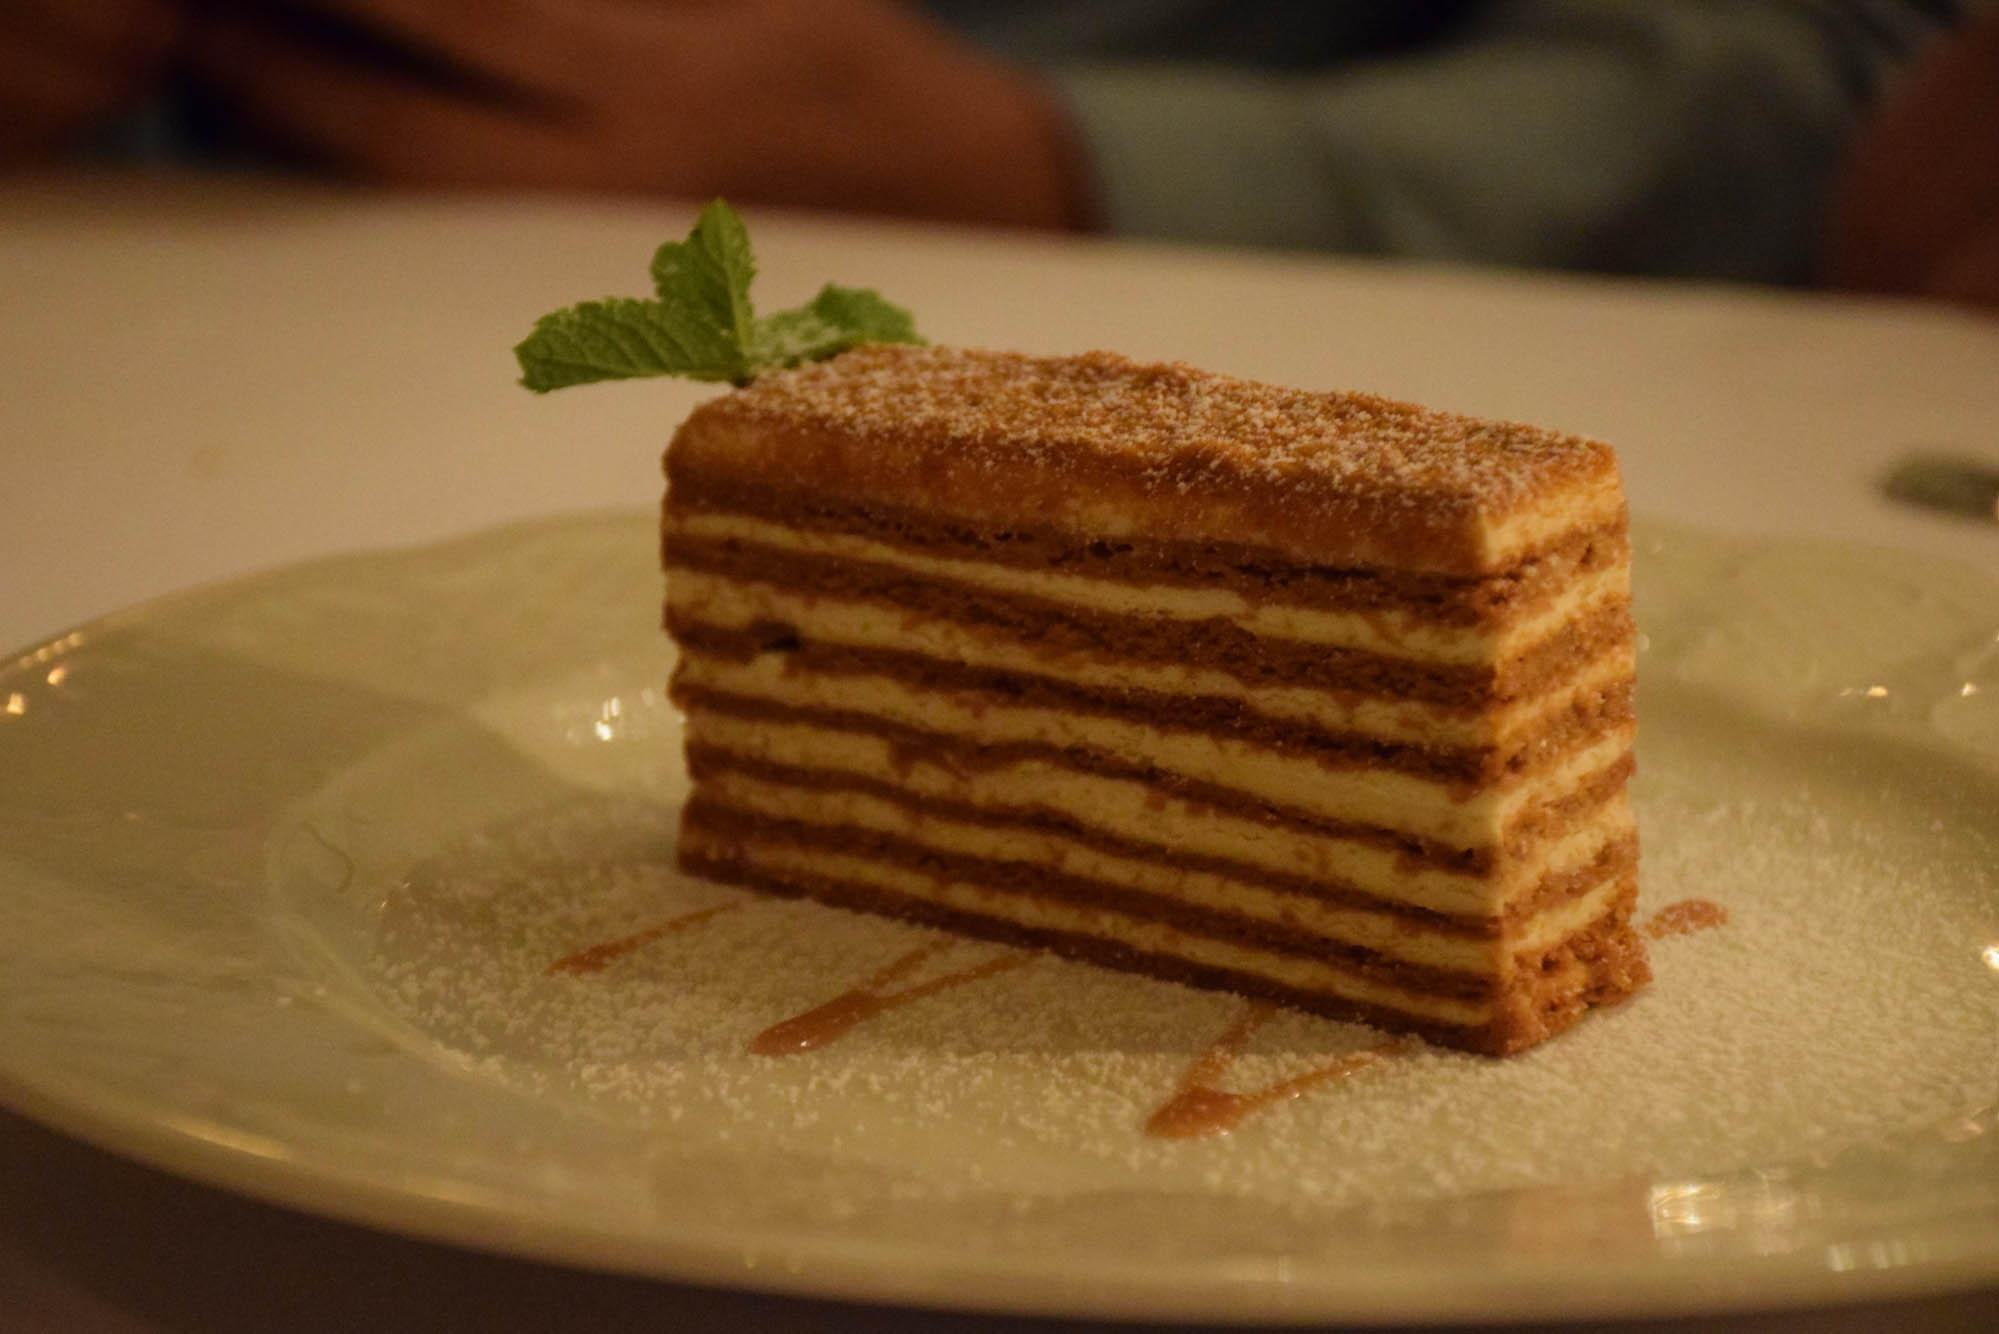 TZAR Restaurant st petersburg russia where to eat medovik layer honey cake